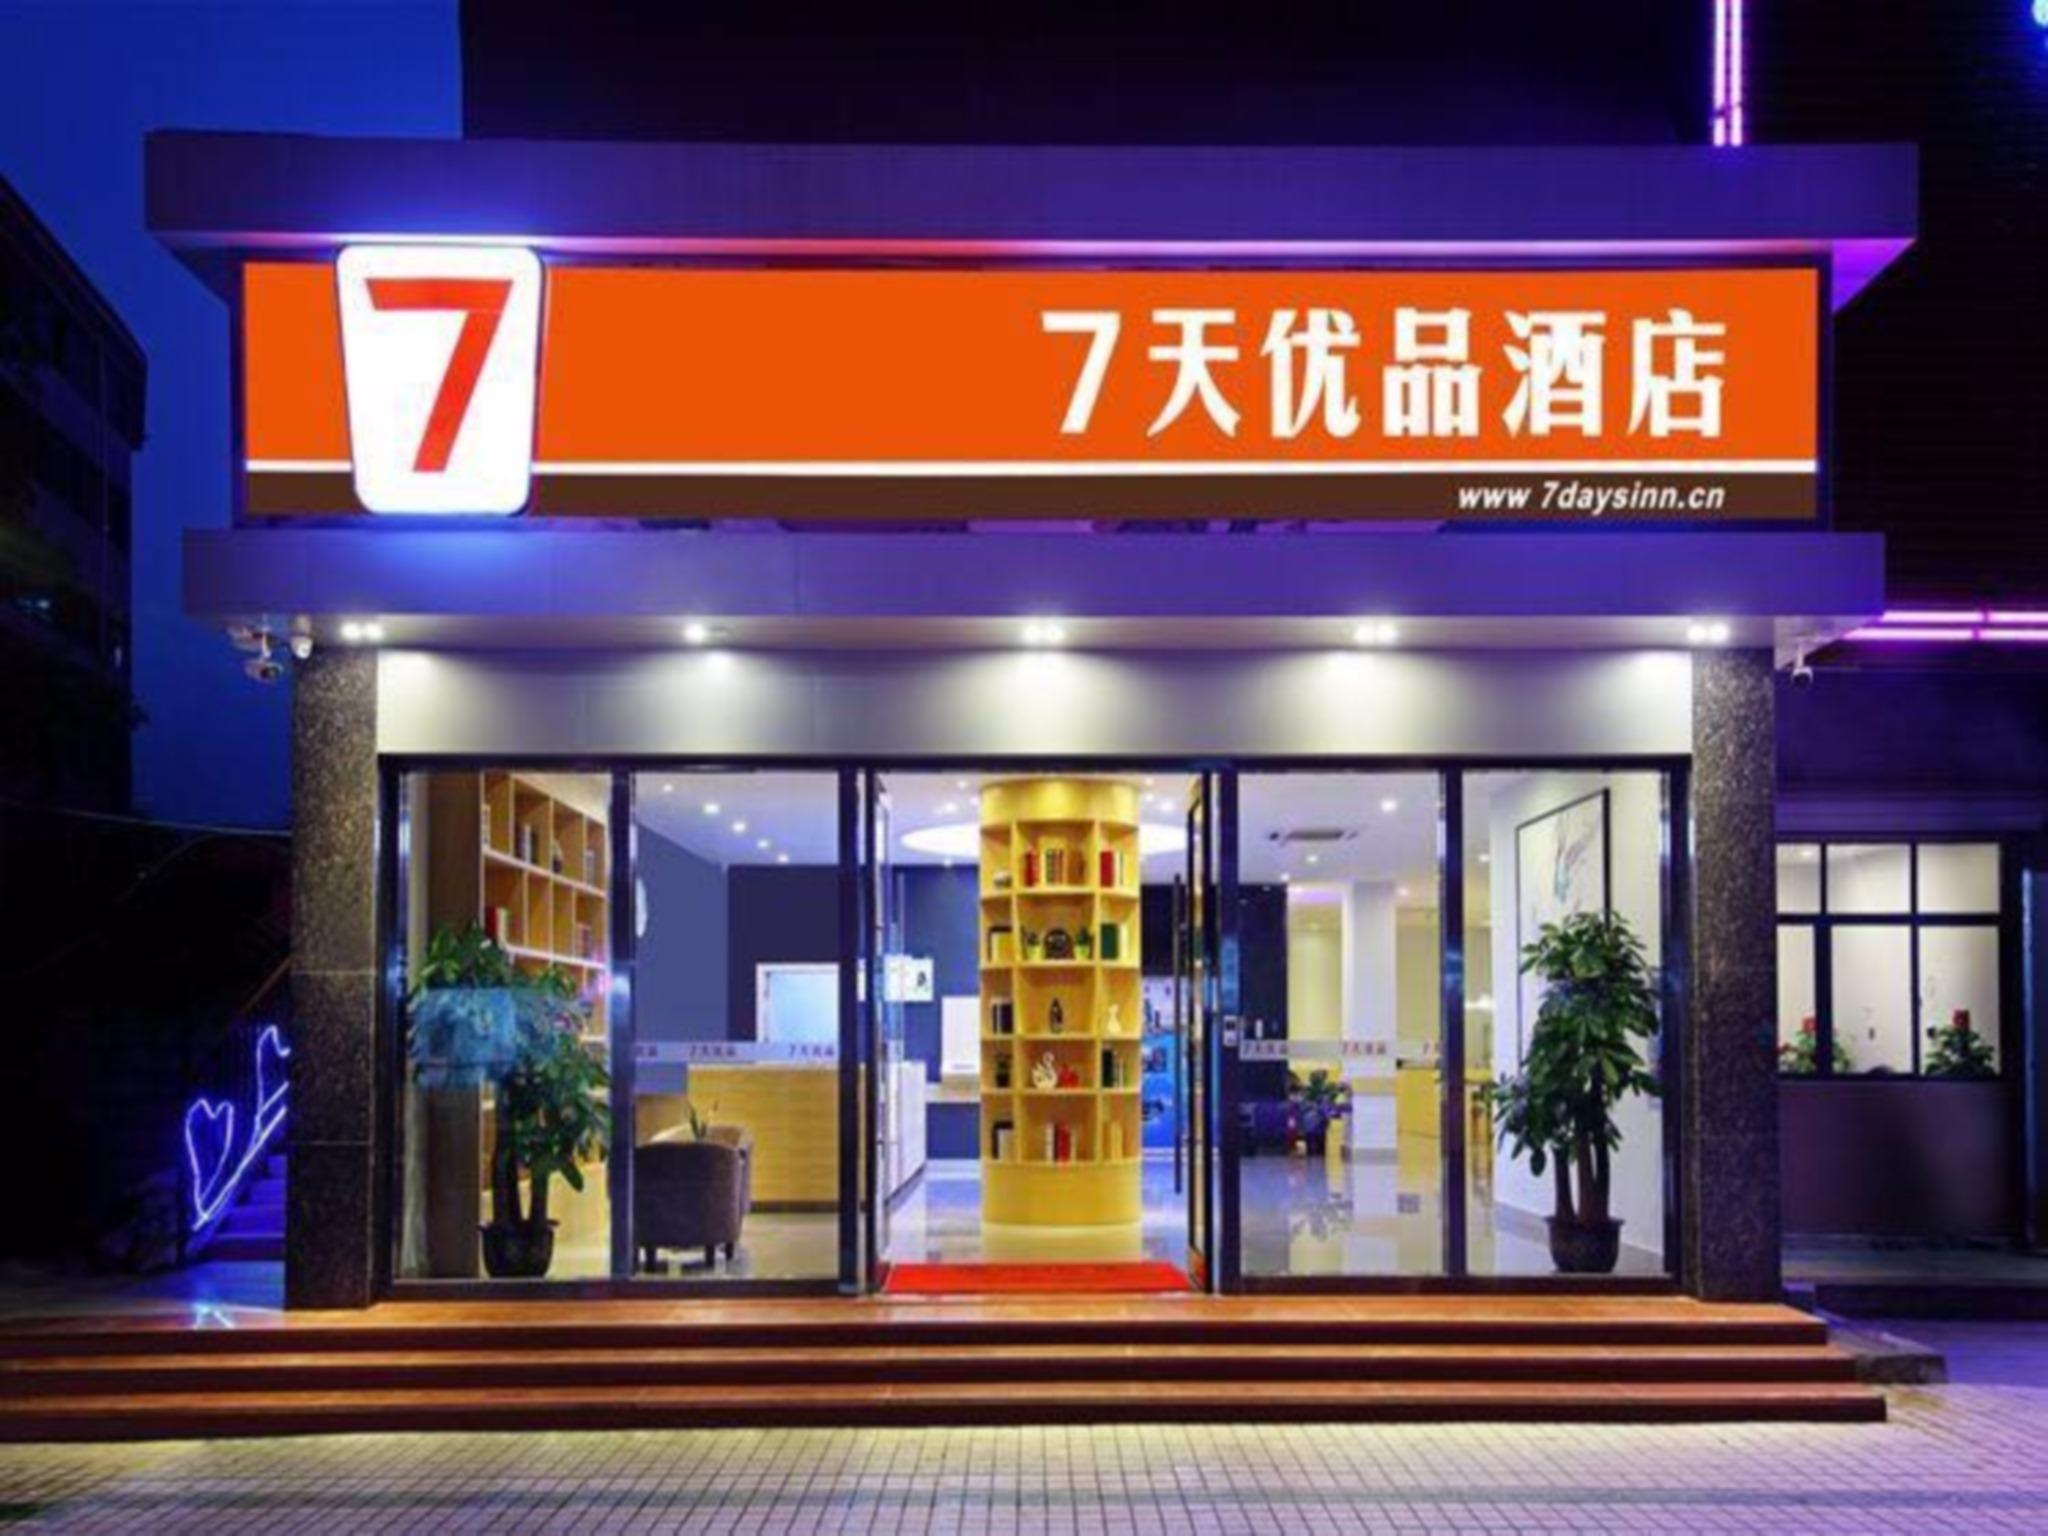 7 Days Premium Shenzhen Longgang Pinghu Railway Station Branch